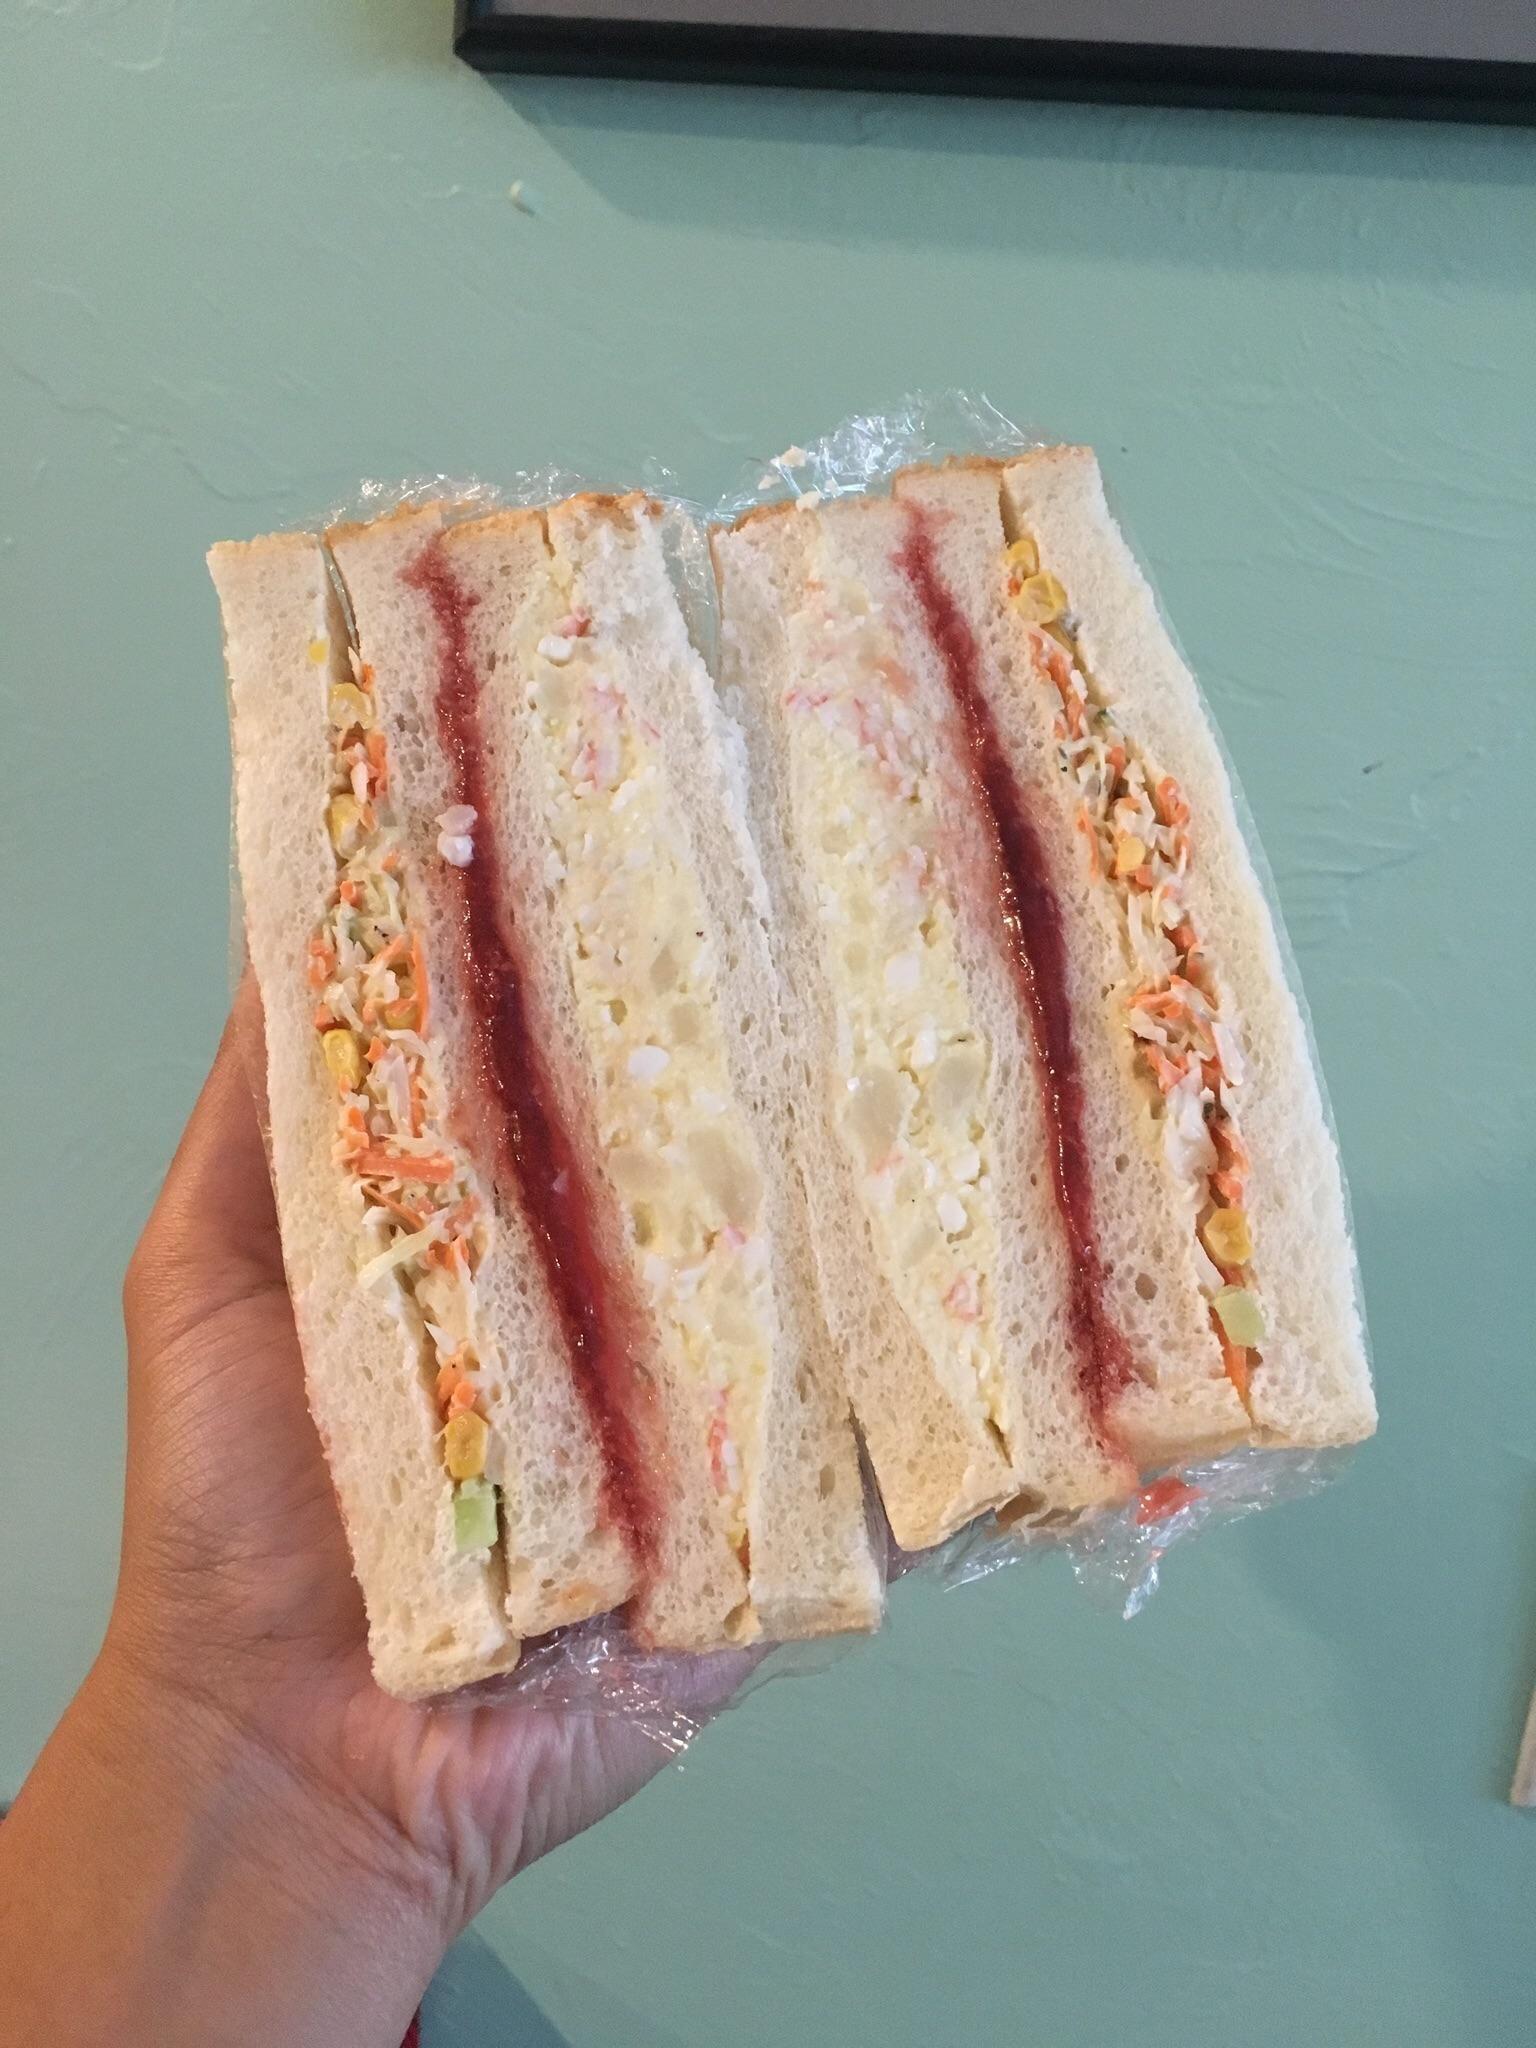 Homemade Inkigayo Sandwich Healty Food Food Cravings Yummy Food